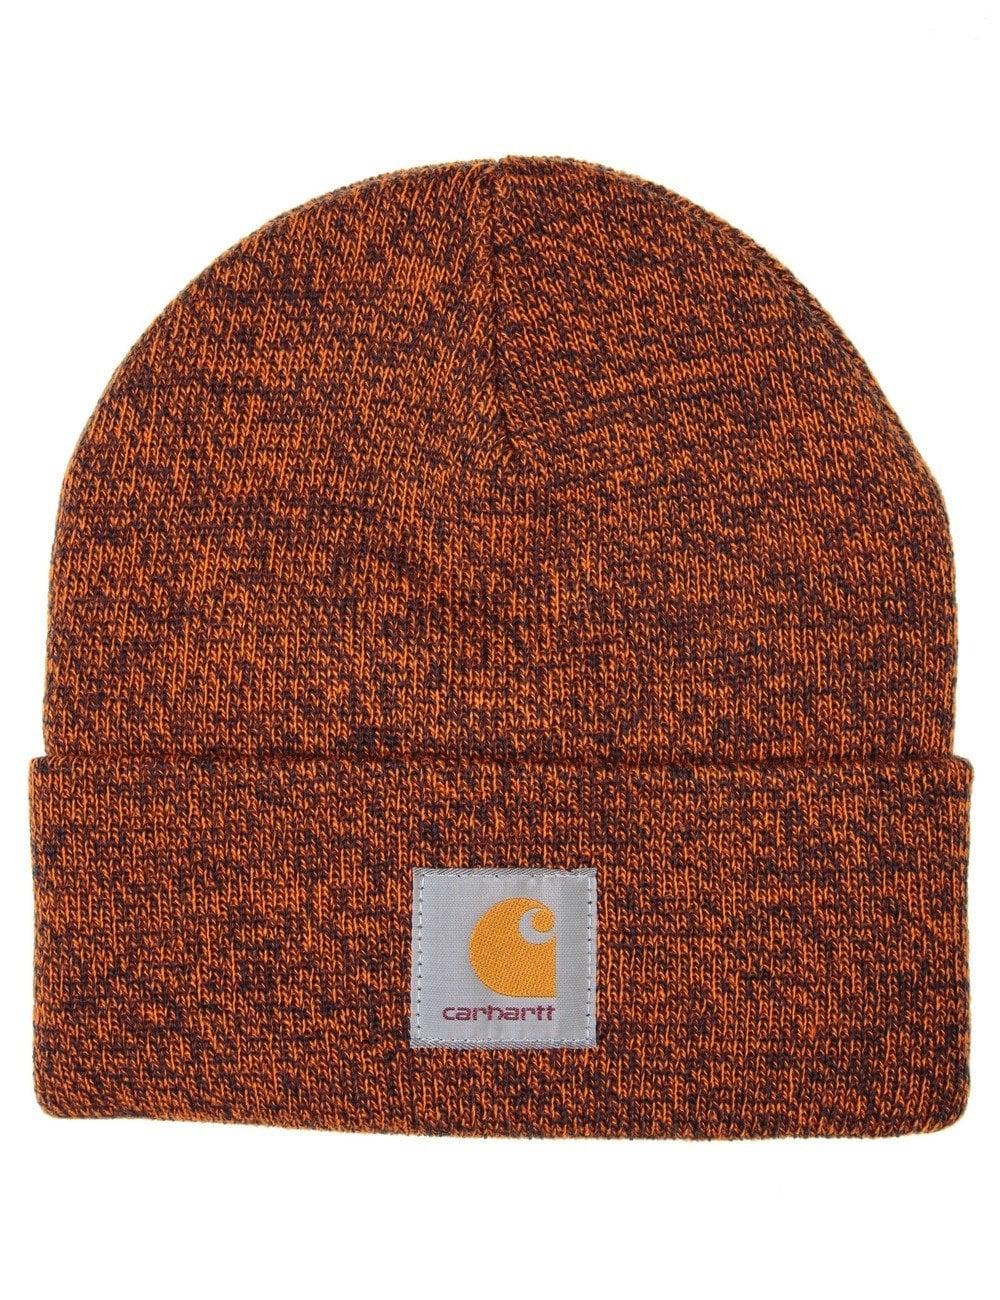 baeba6dedcada Carhartt WIP Scott Watch Hat - Dark Navy Carhartt Orange ...